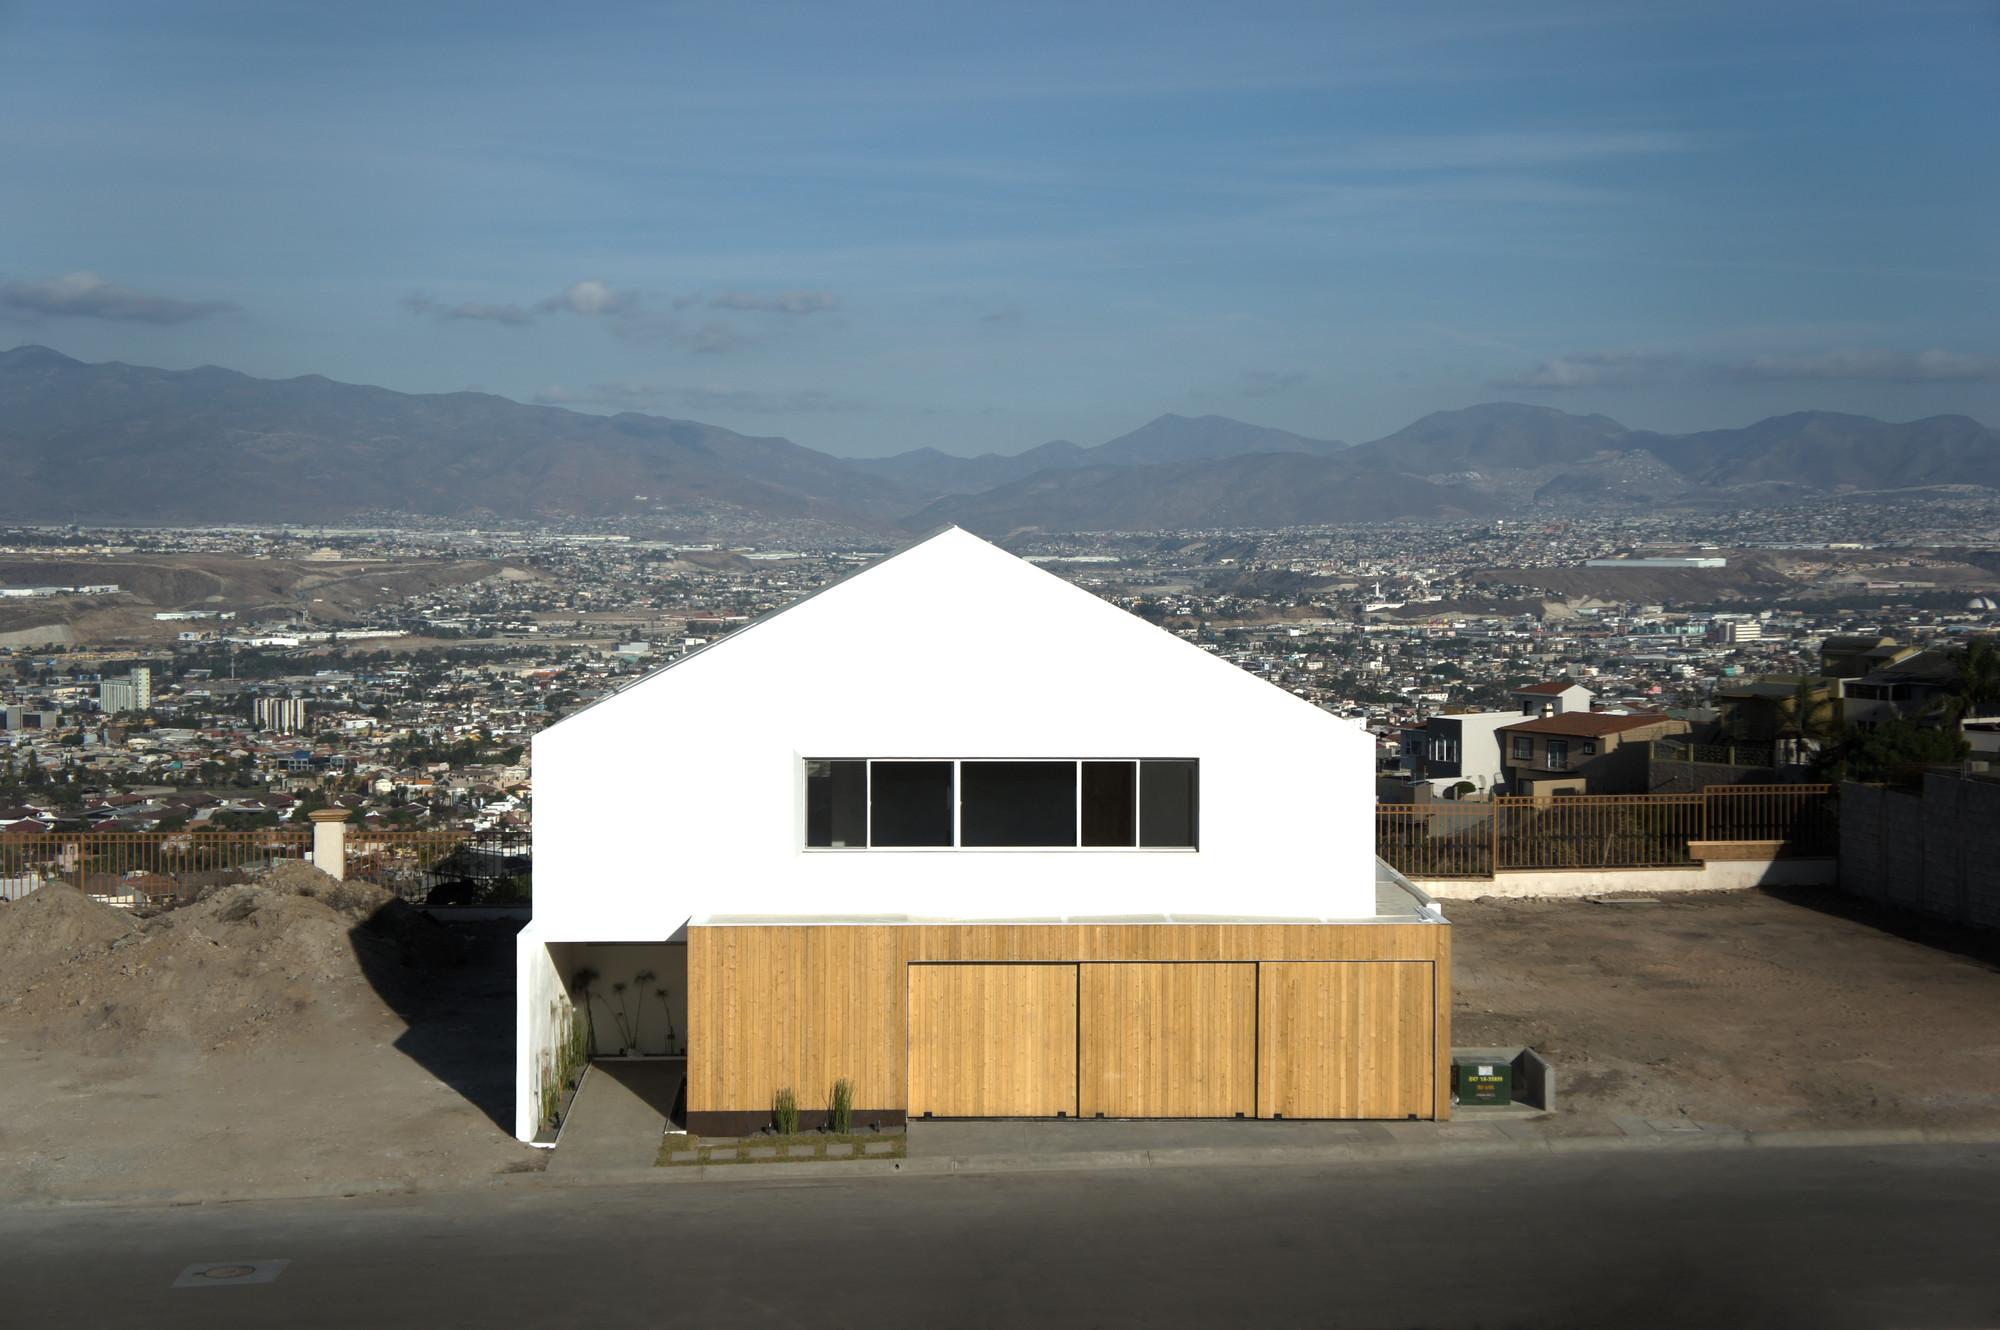 HDJ86 / T38 studio + Pablo Casals-Aguirre, © Alfresco